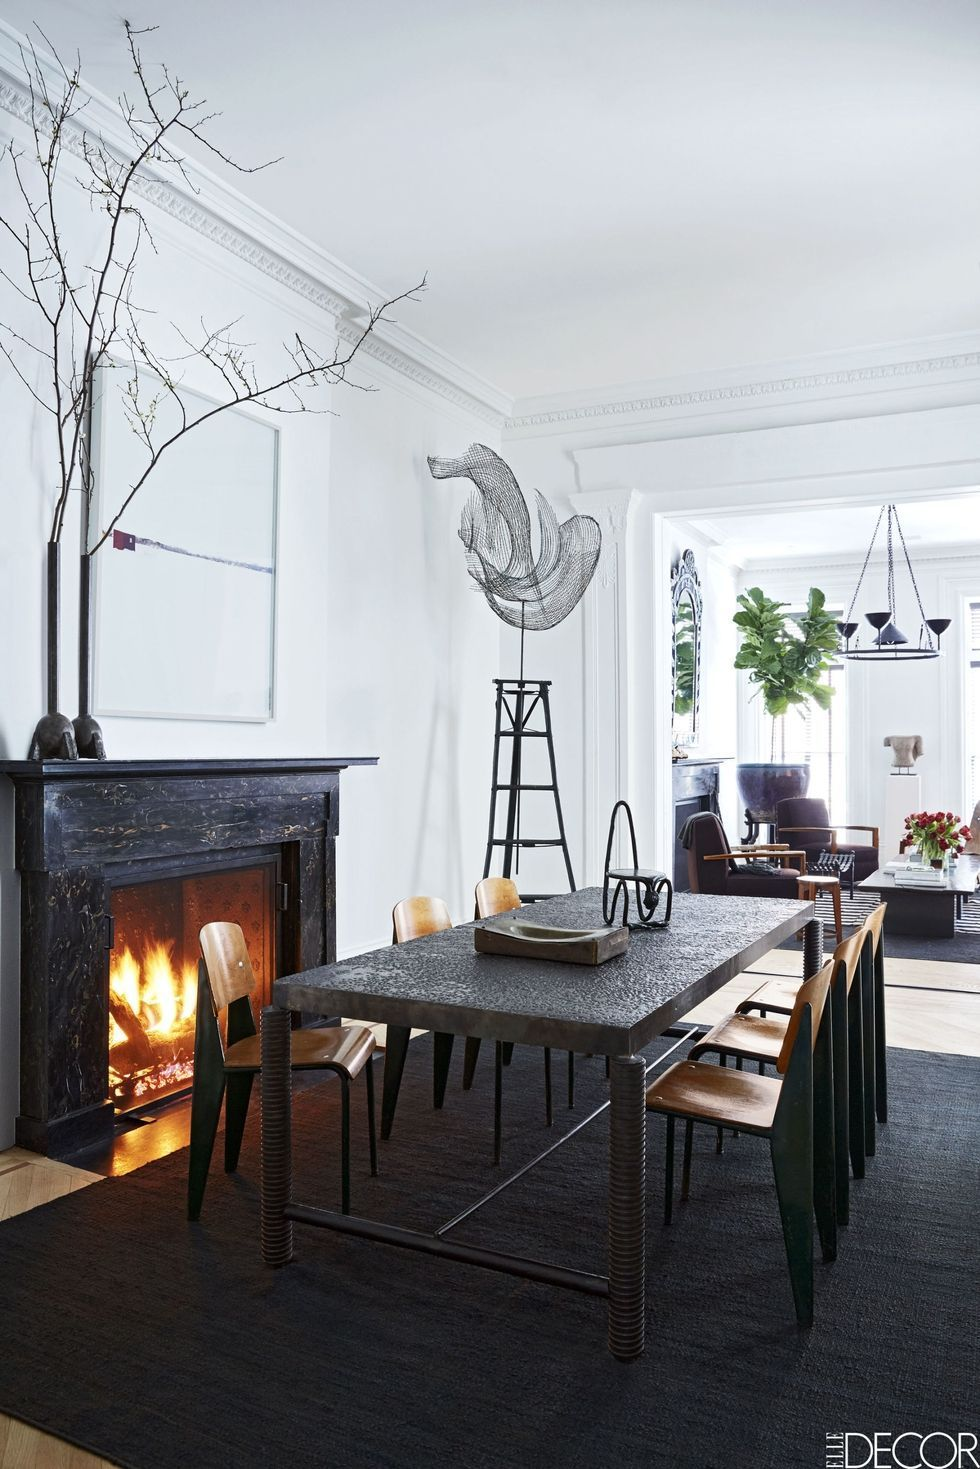 24 Unique Fireplace Mantel Ideas – Modern Fireplace Designs